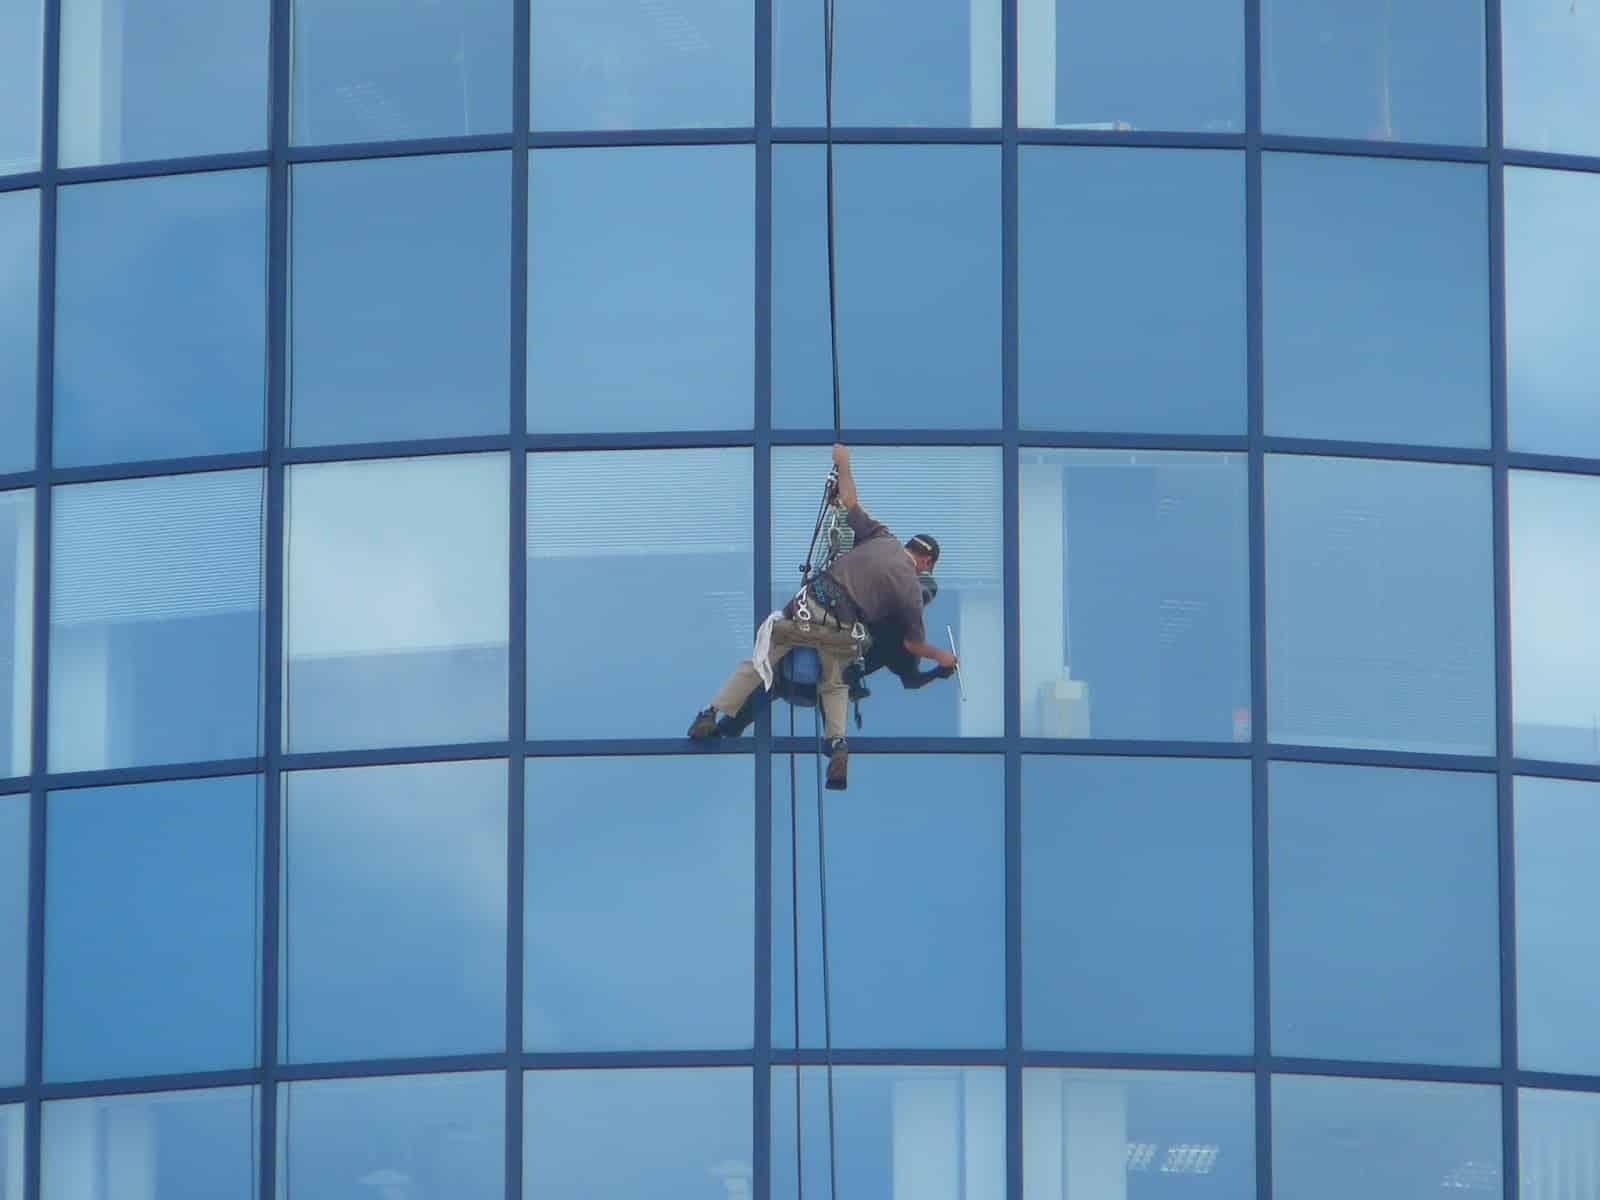 شركة تنظيف واجهات زجاج بابها 0555024104